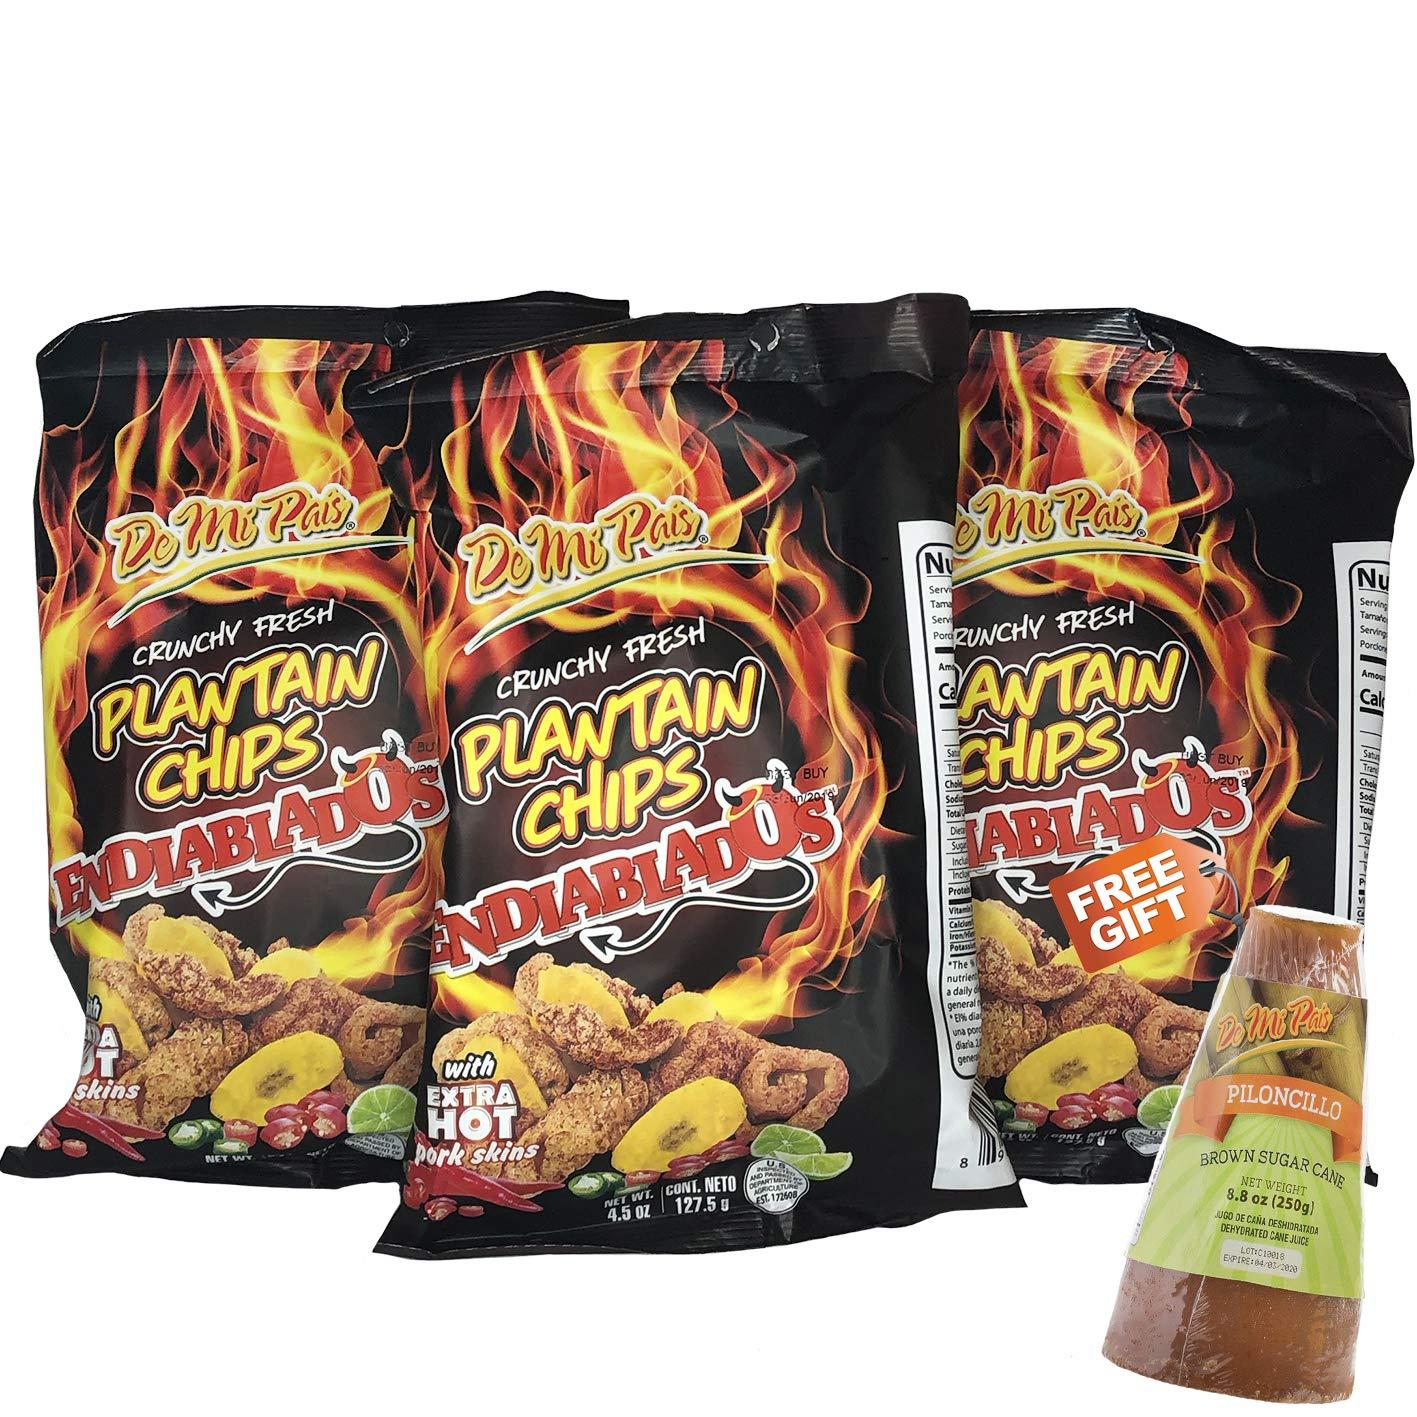 DMP Plantain Chips Devil/Endiablados 12-PACK - FREE GIFT